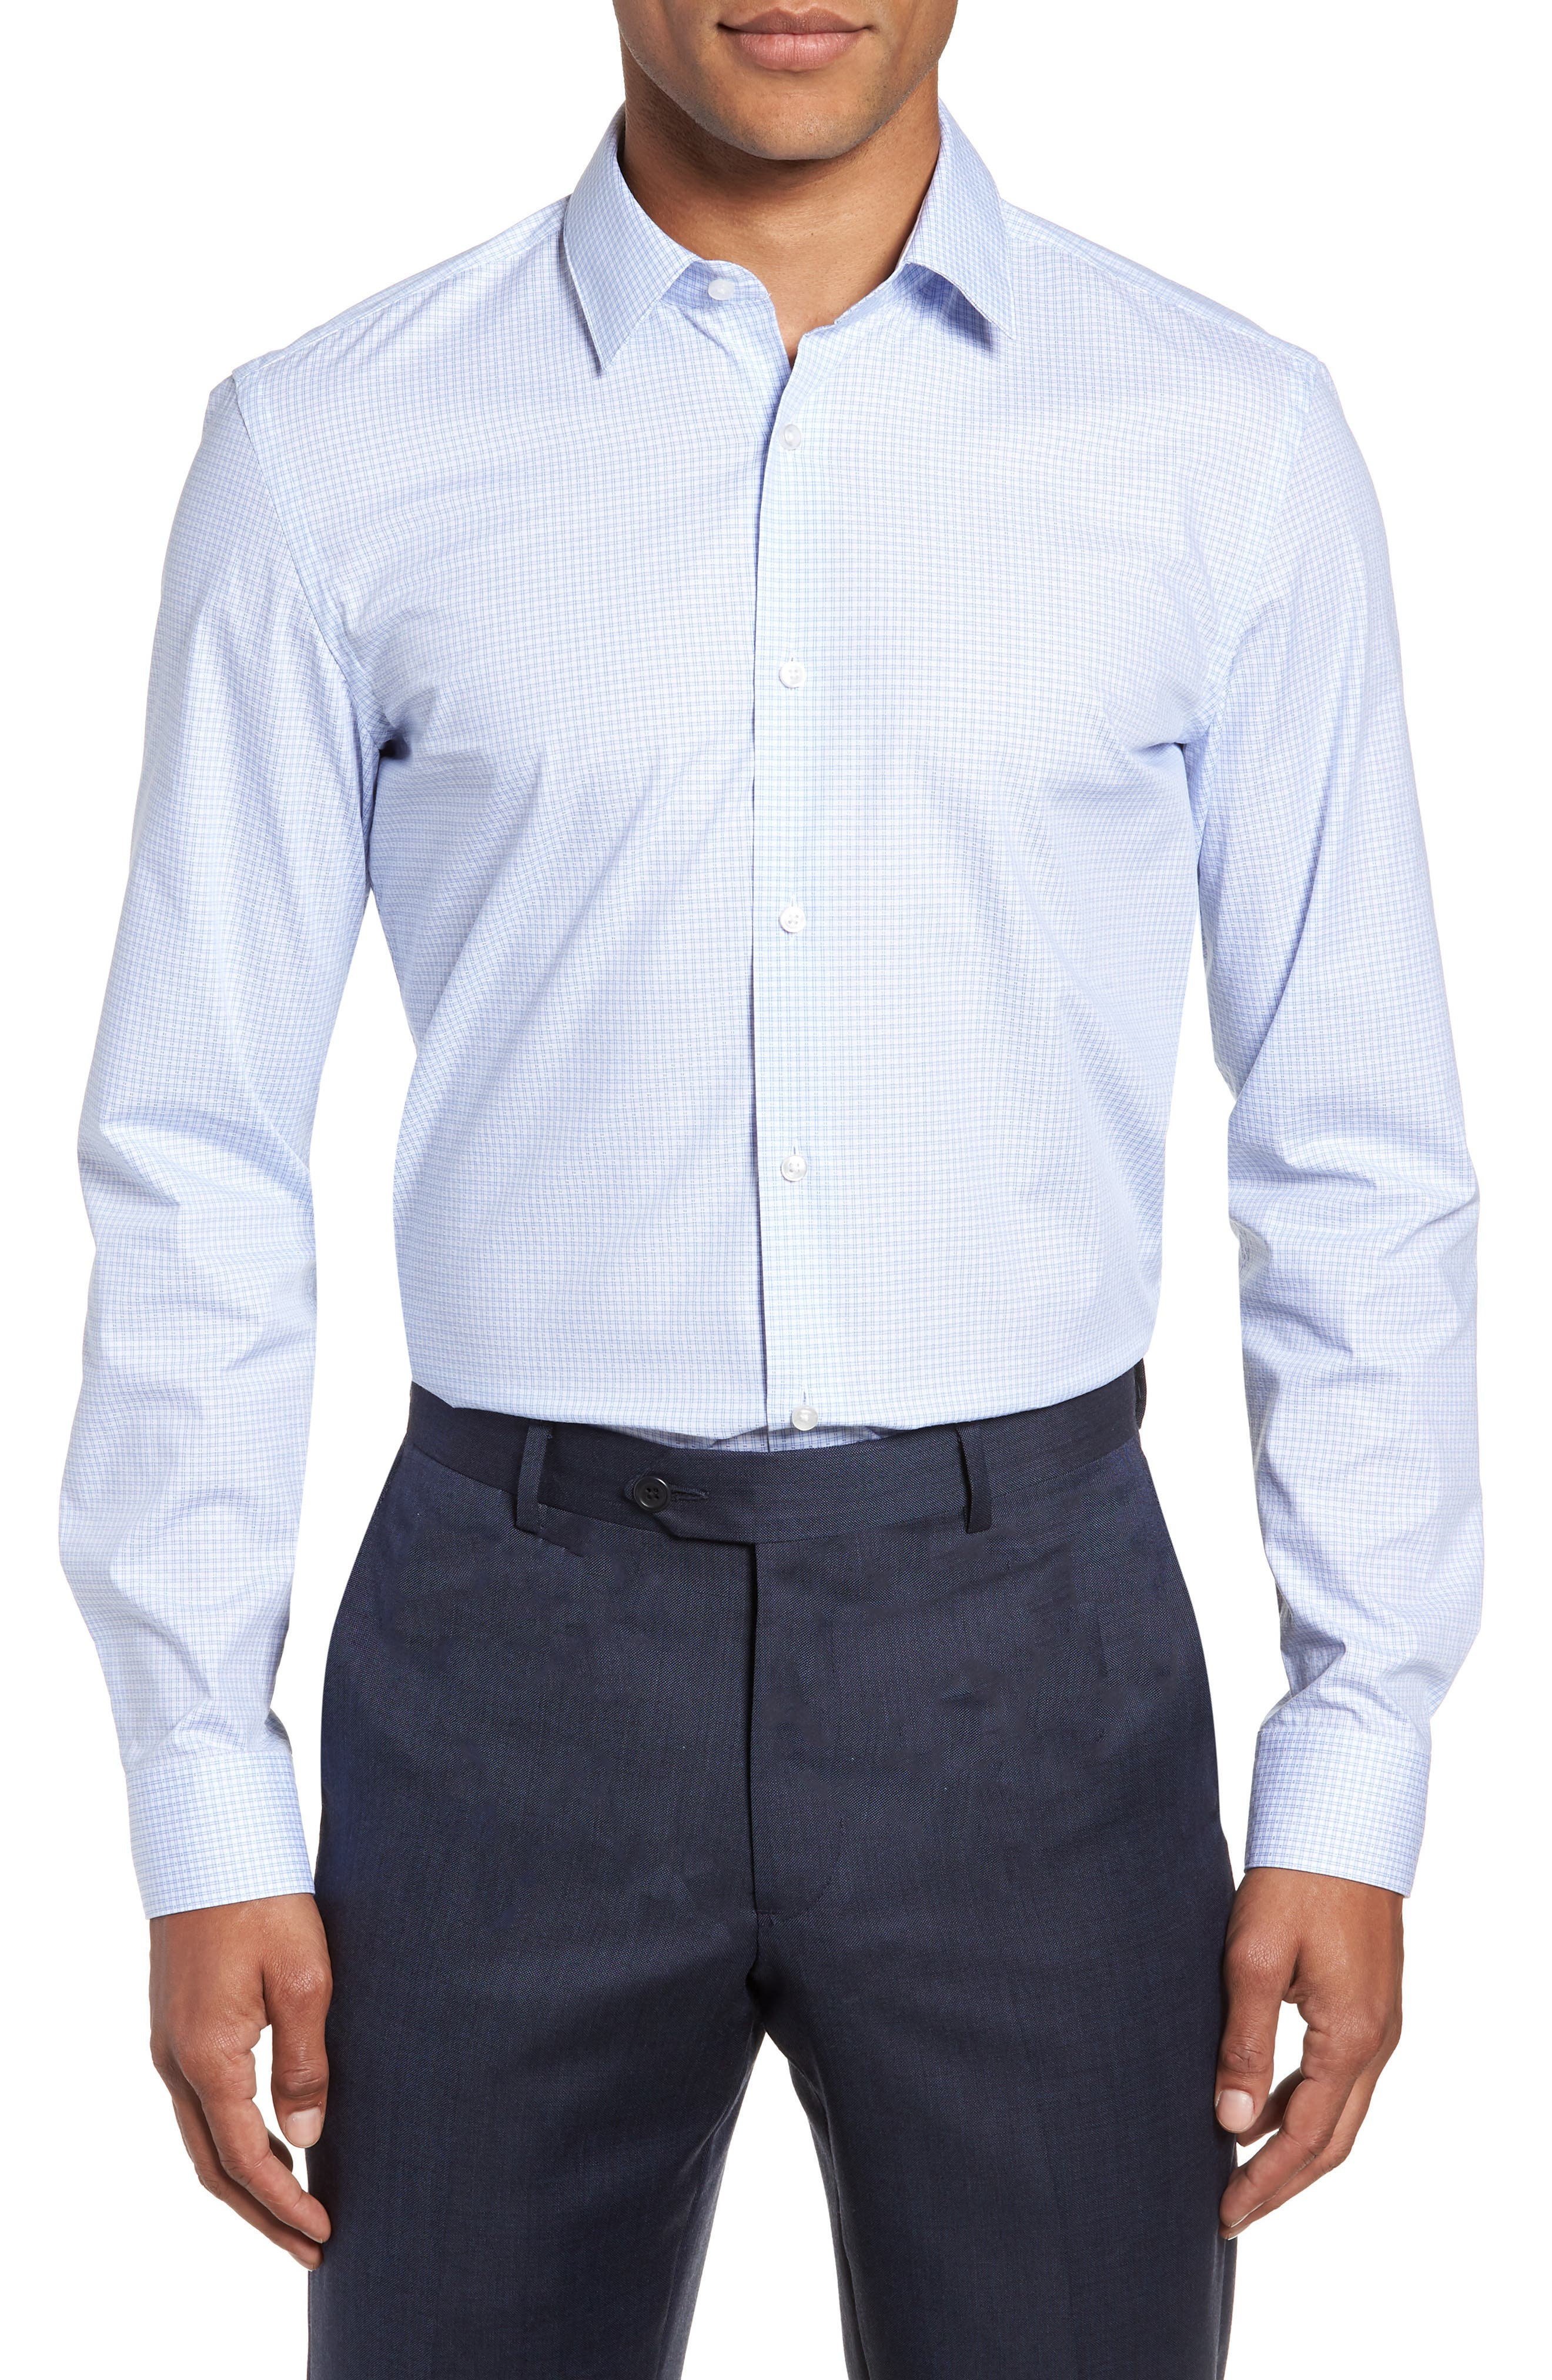 Isko Slim Fit Stretch Check Dress Shirt,                             Main thumbnail 1, color,                             450